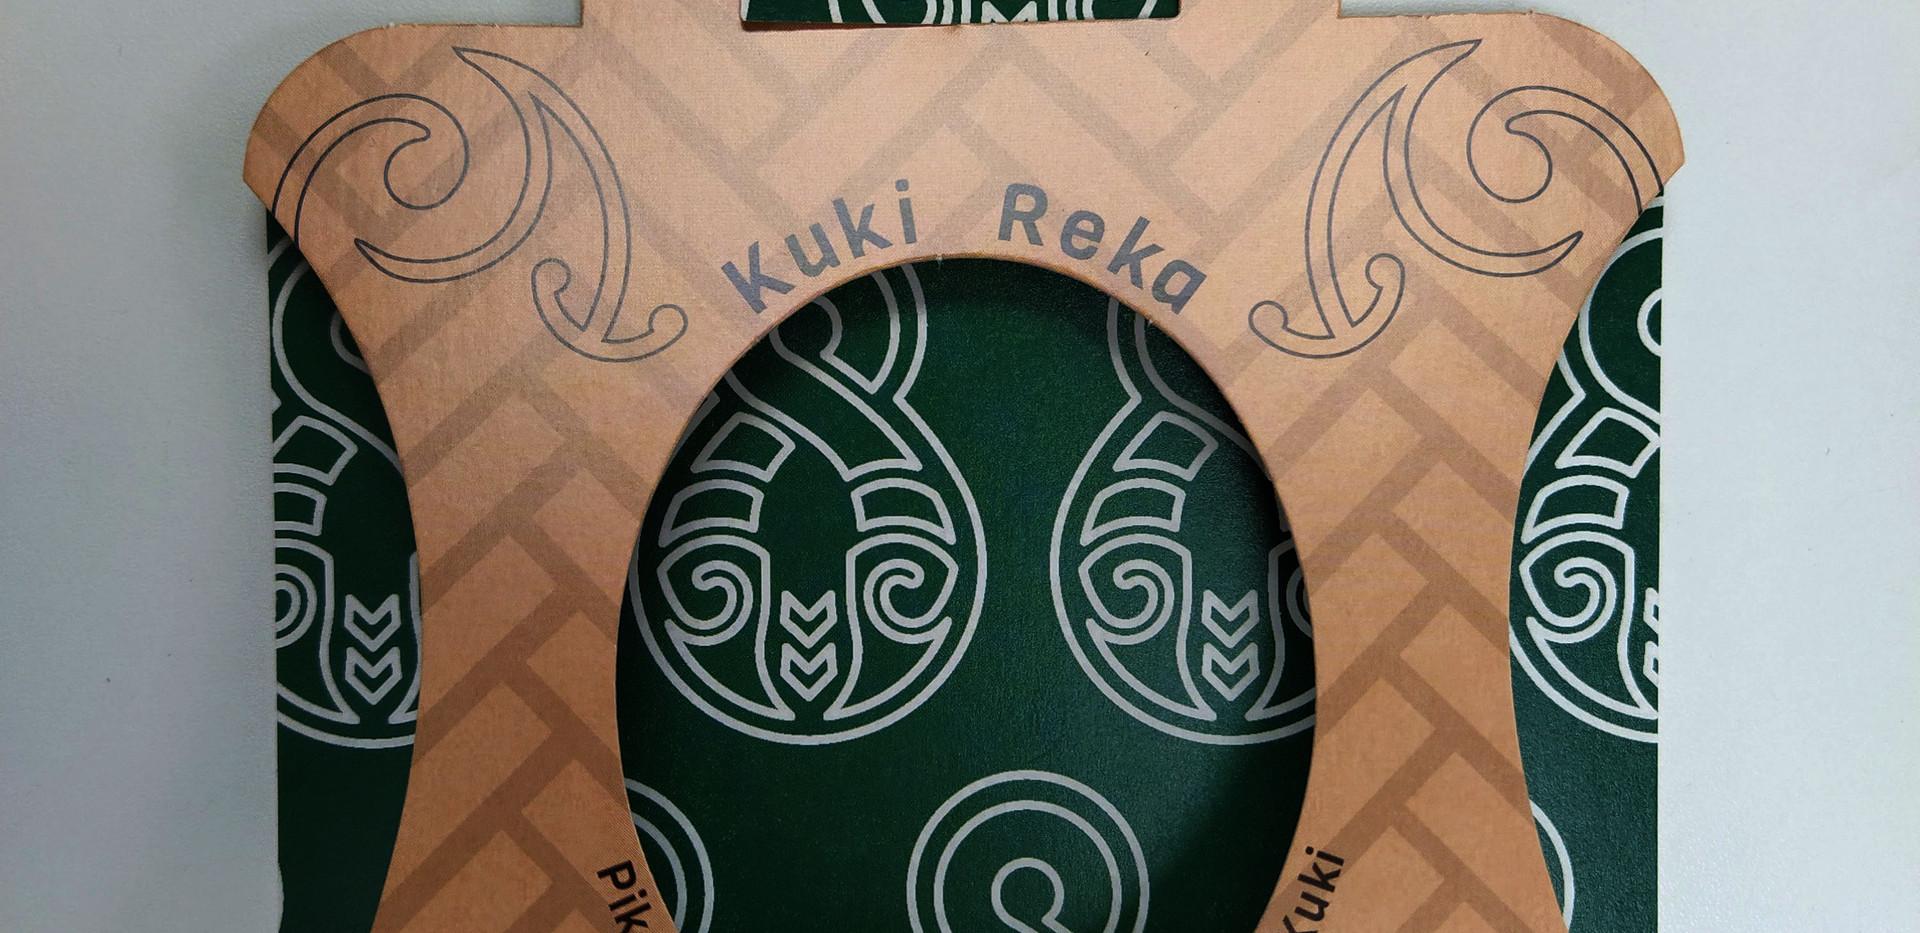 Pikorua Cookie Packaging